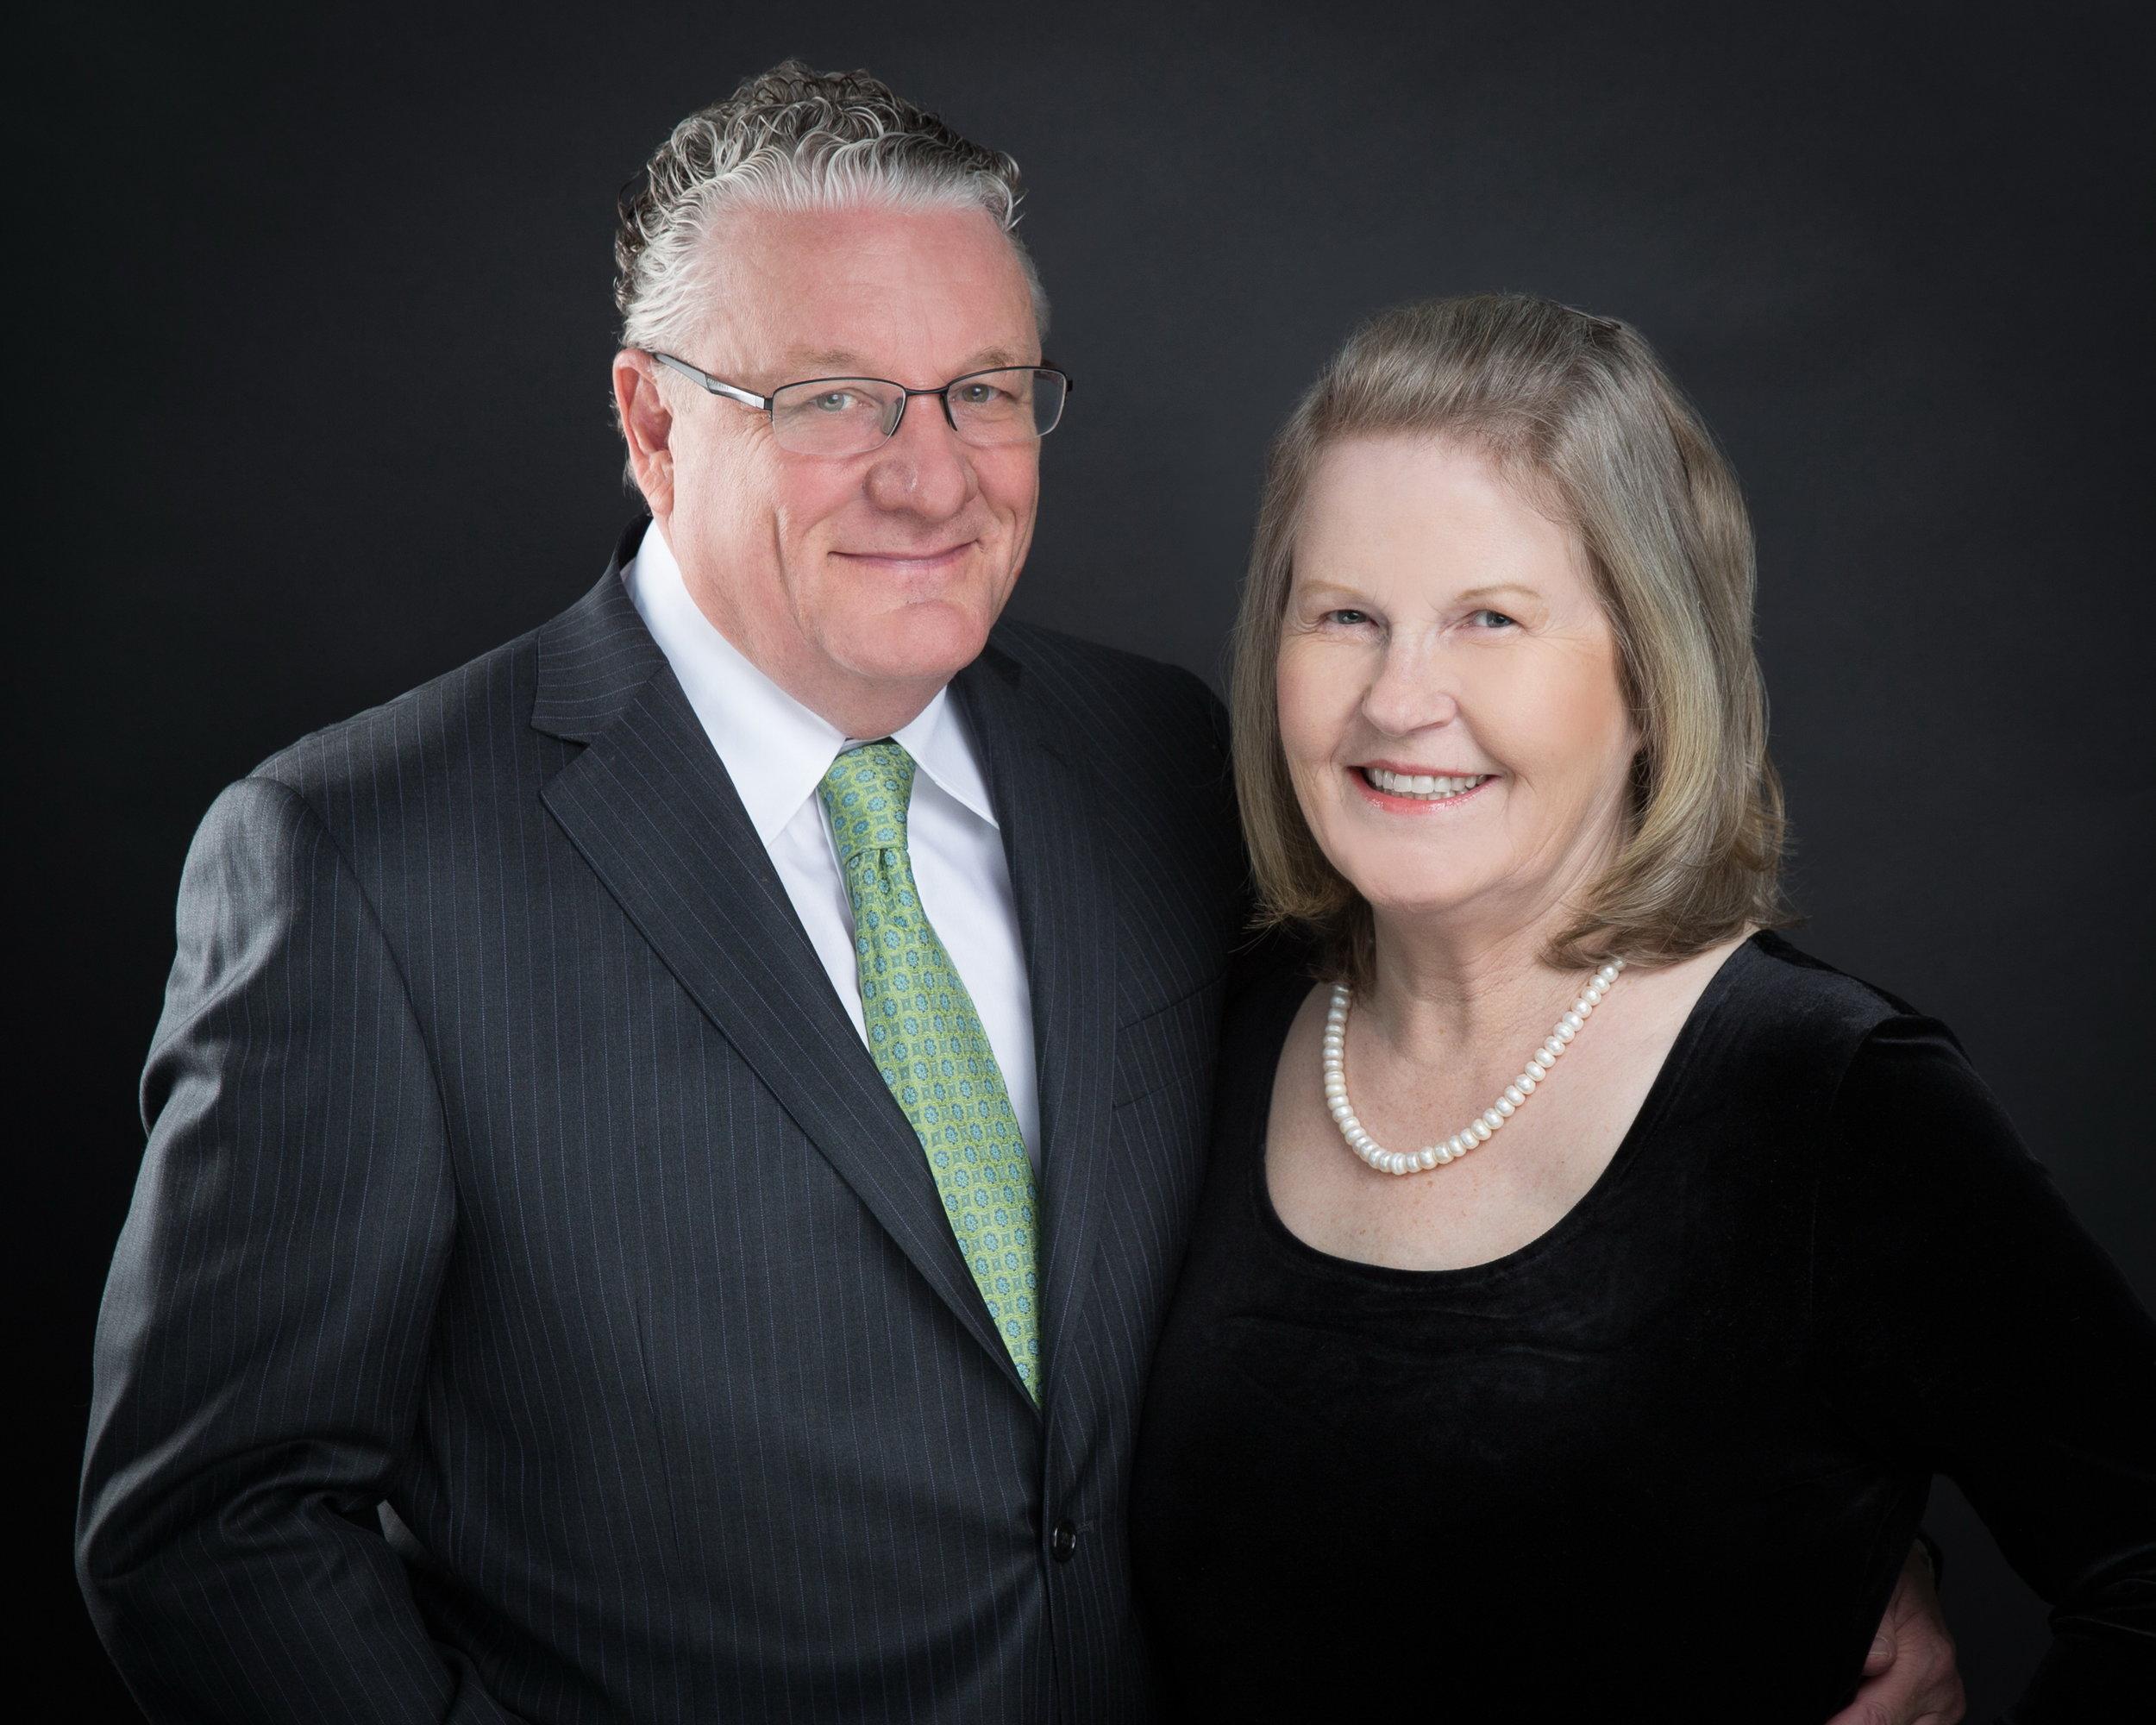 Professor David Maidment (1968-70) and Dr Helen Maidment, illustrious College House benefactors.